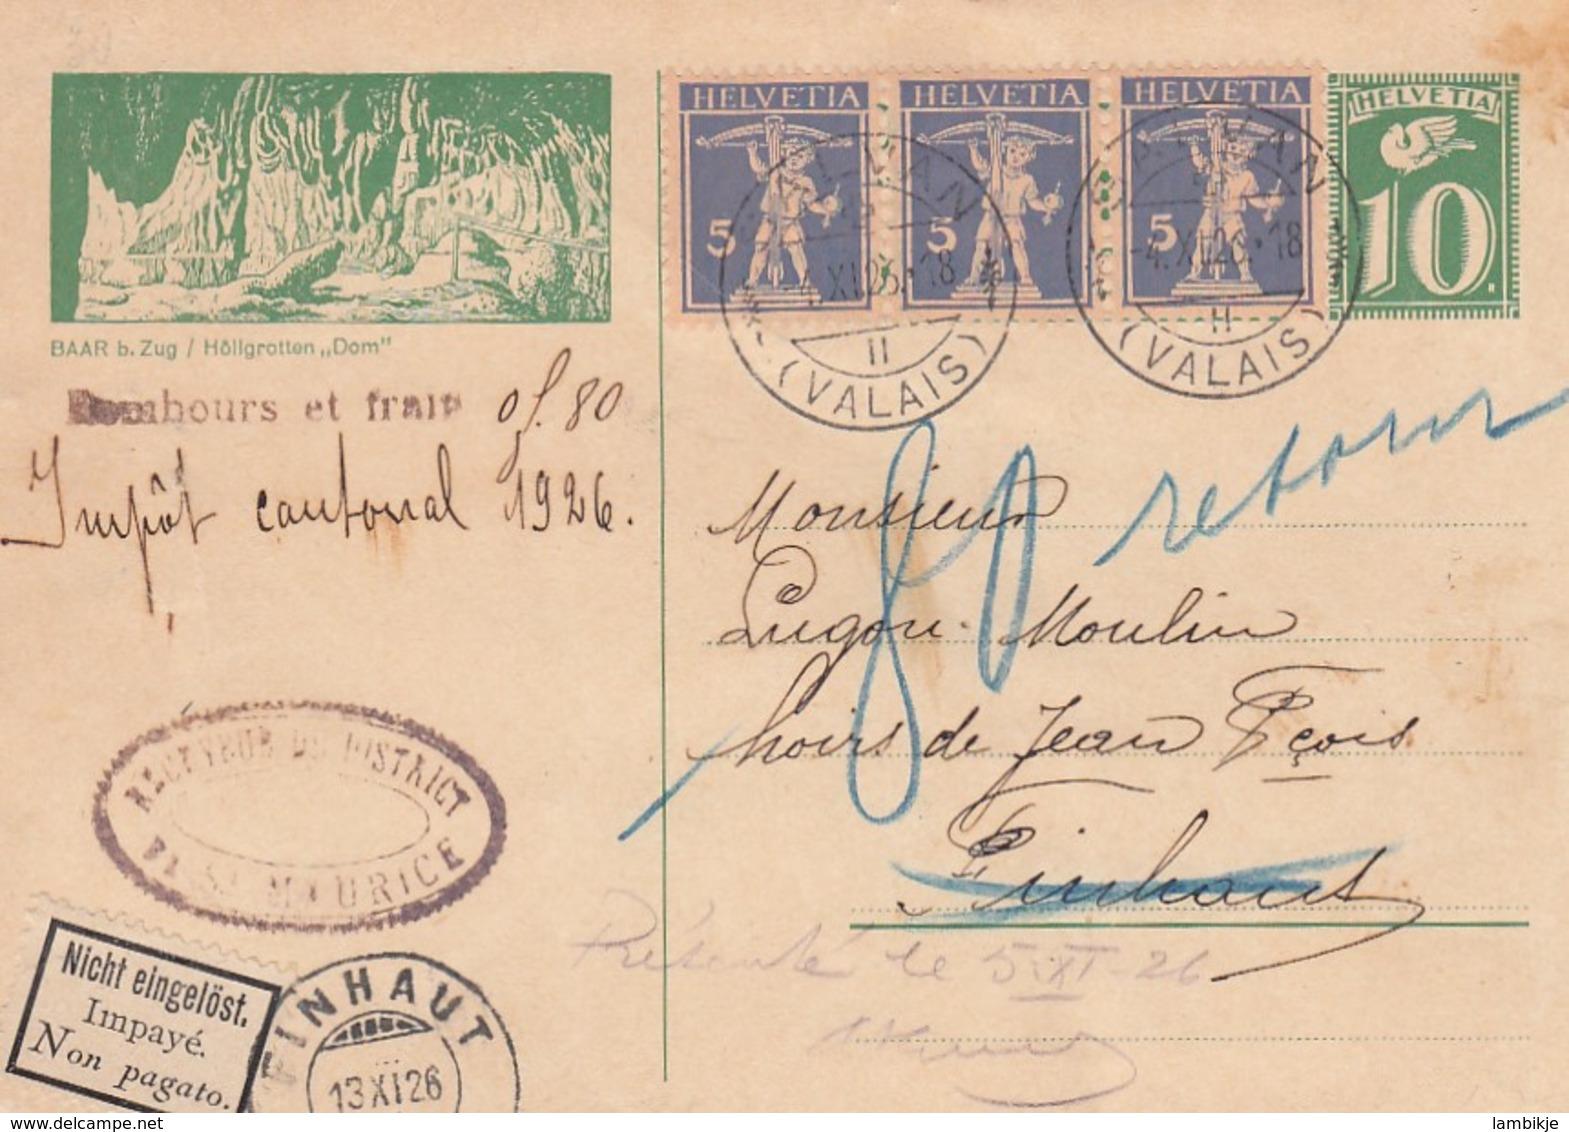 Schweiz Postkarte 1926 - Schweiz